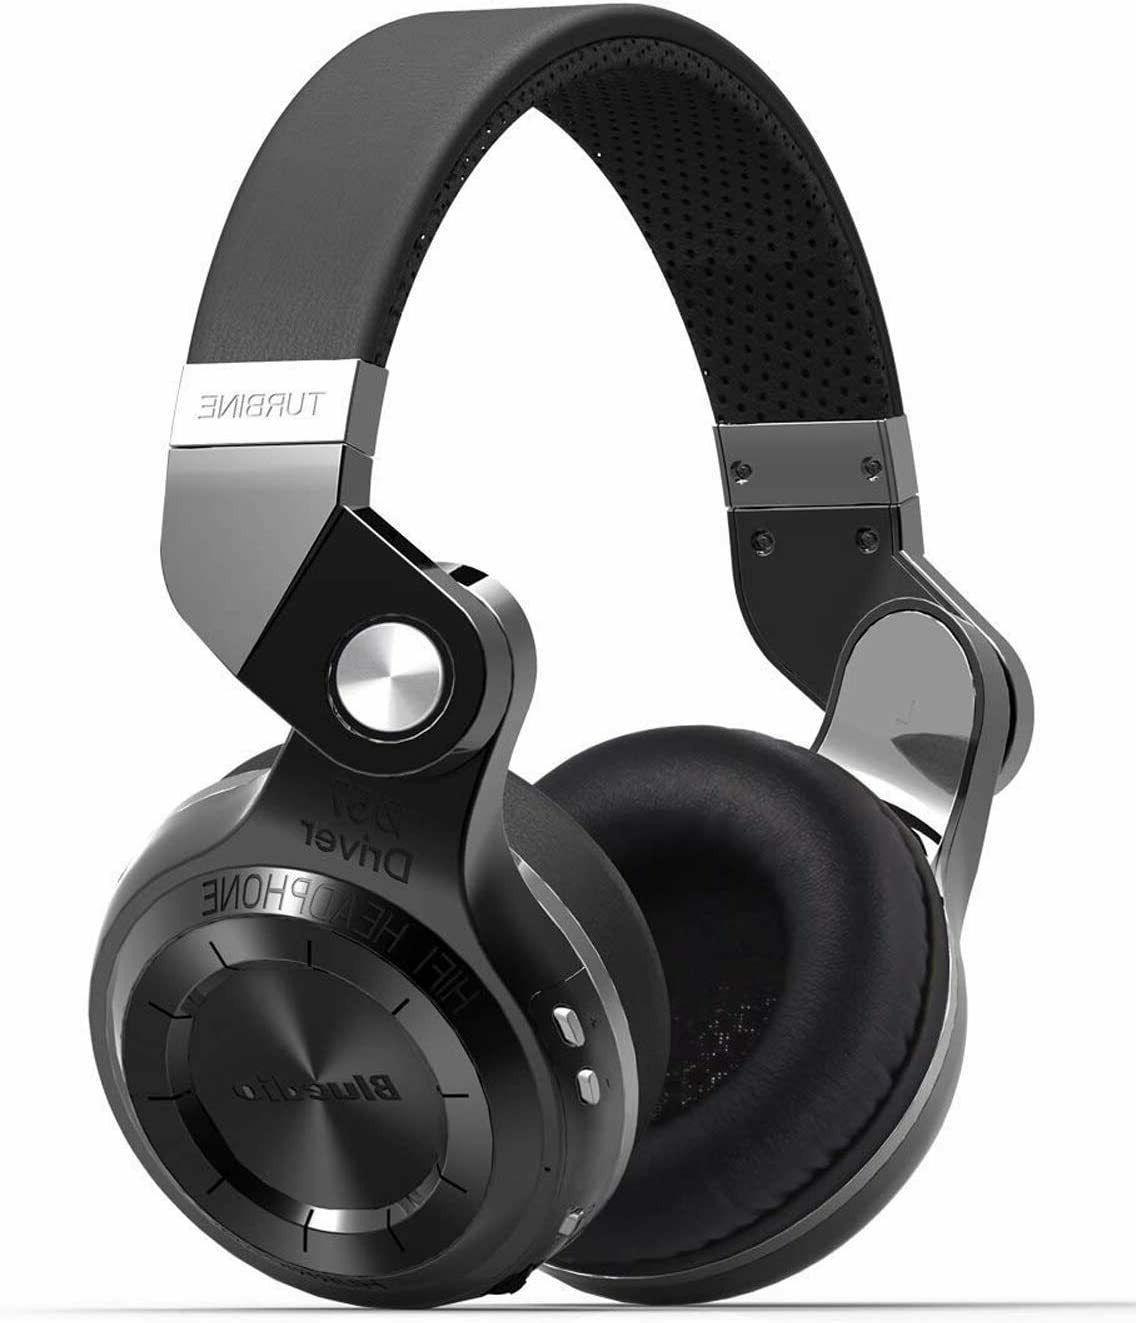 turbine t2s bluetooth 4 1 stereo headsets